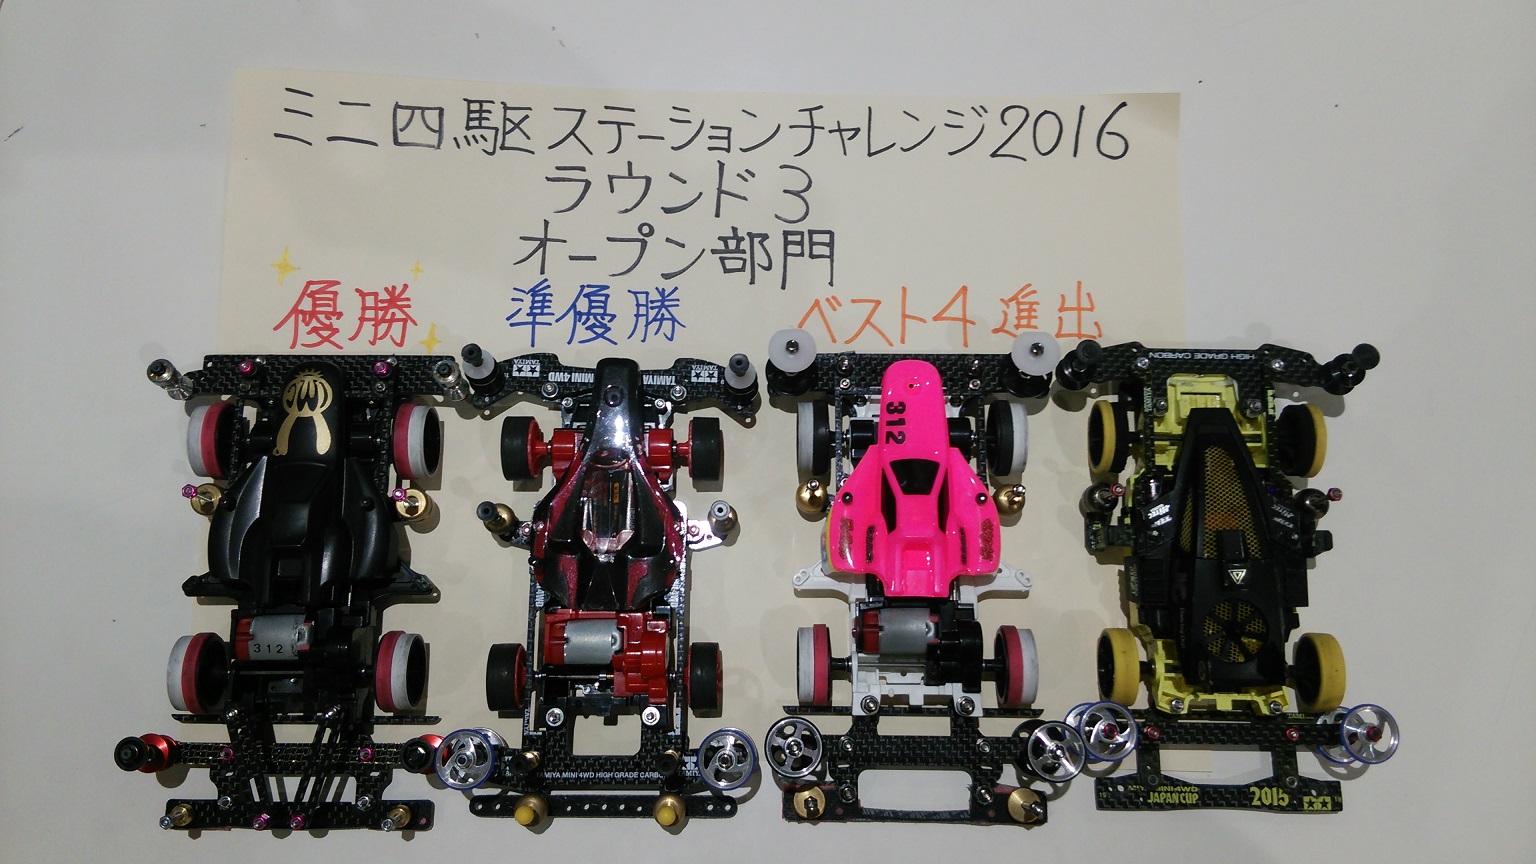 DSC_0141_20161101185000845.jpg